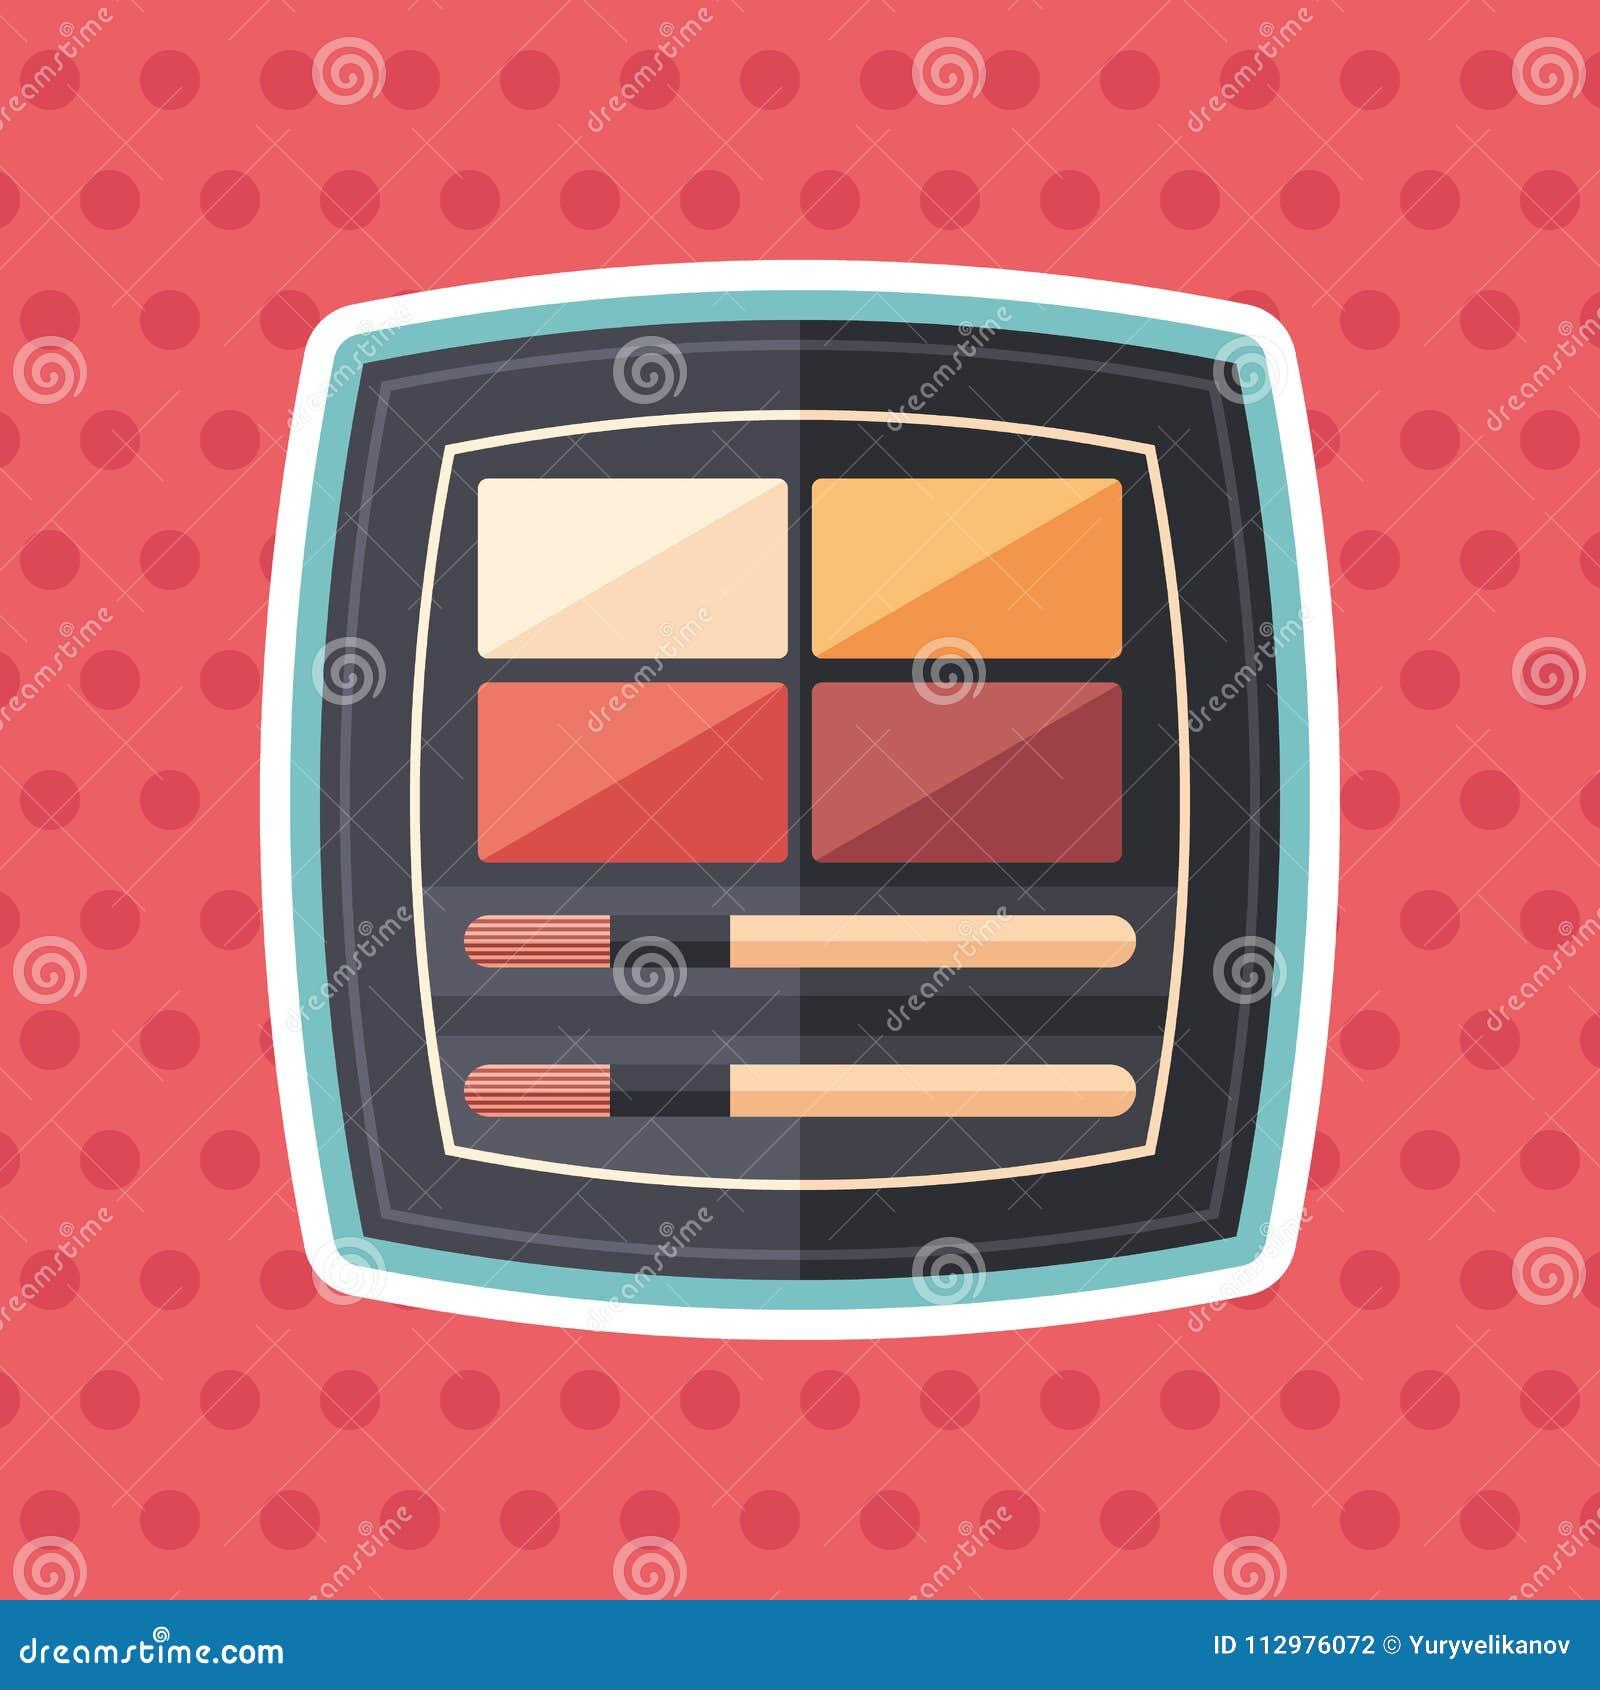 Palette liquid lipsticks sticker flat icon with color background.